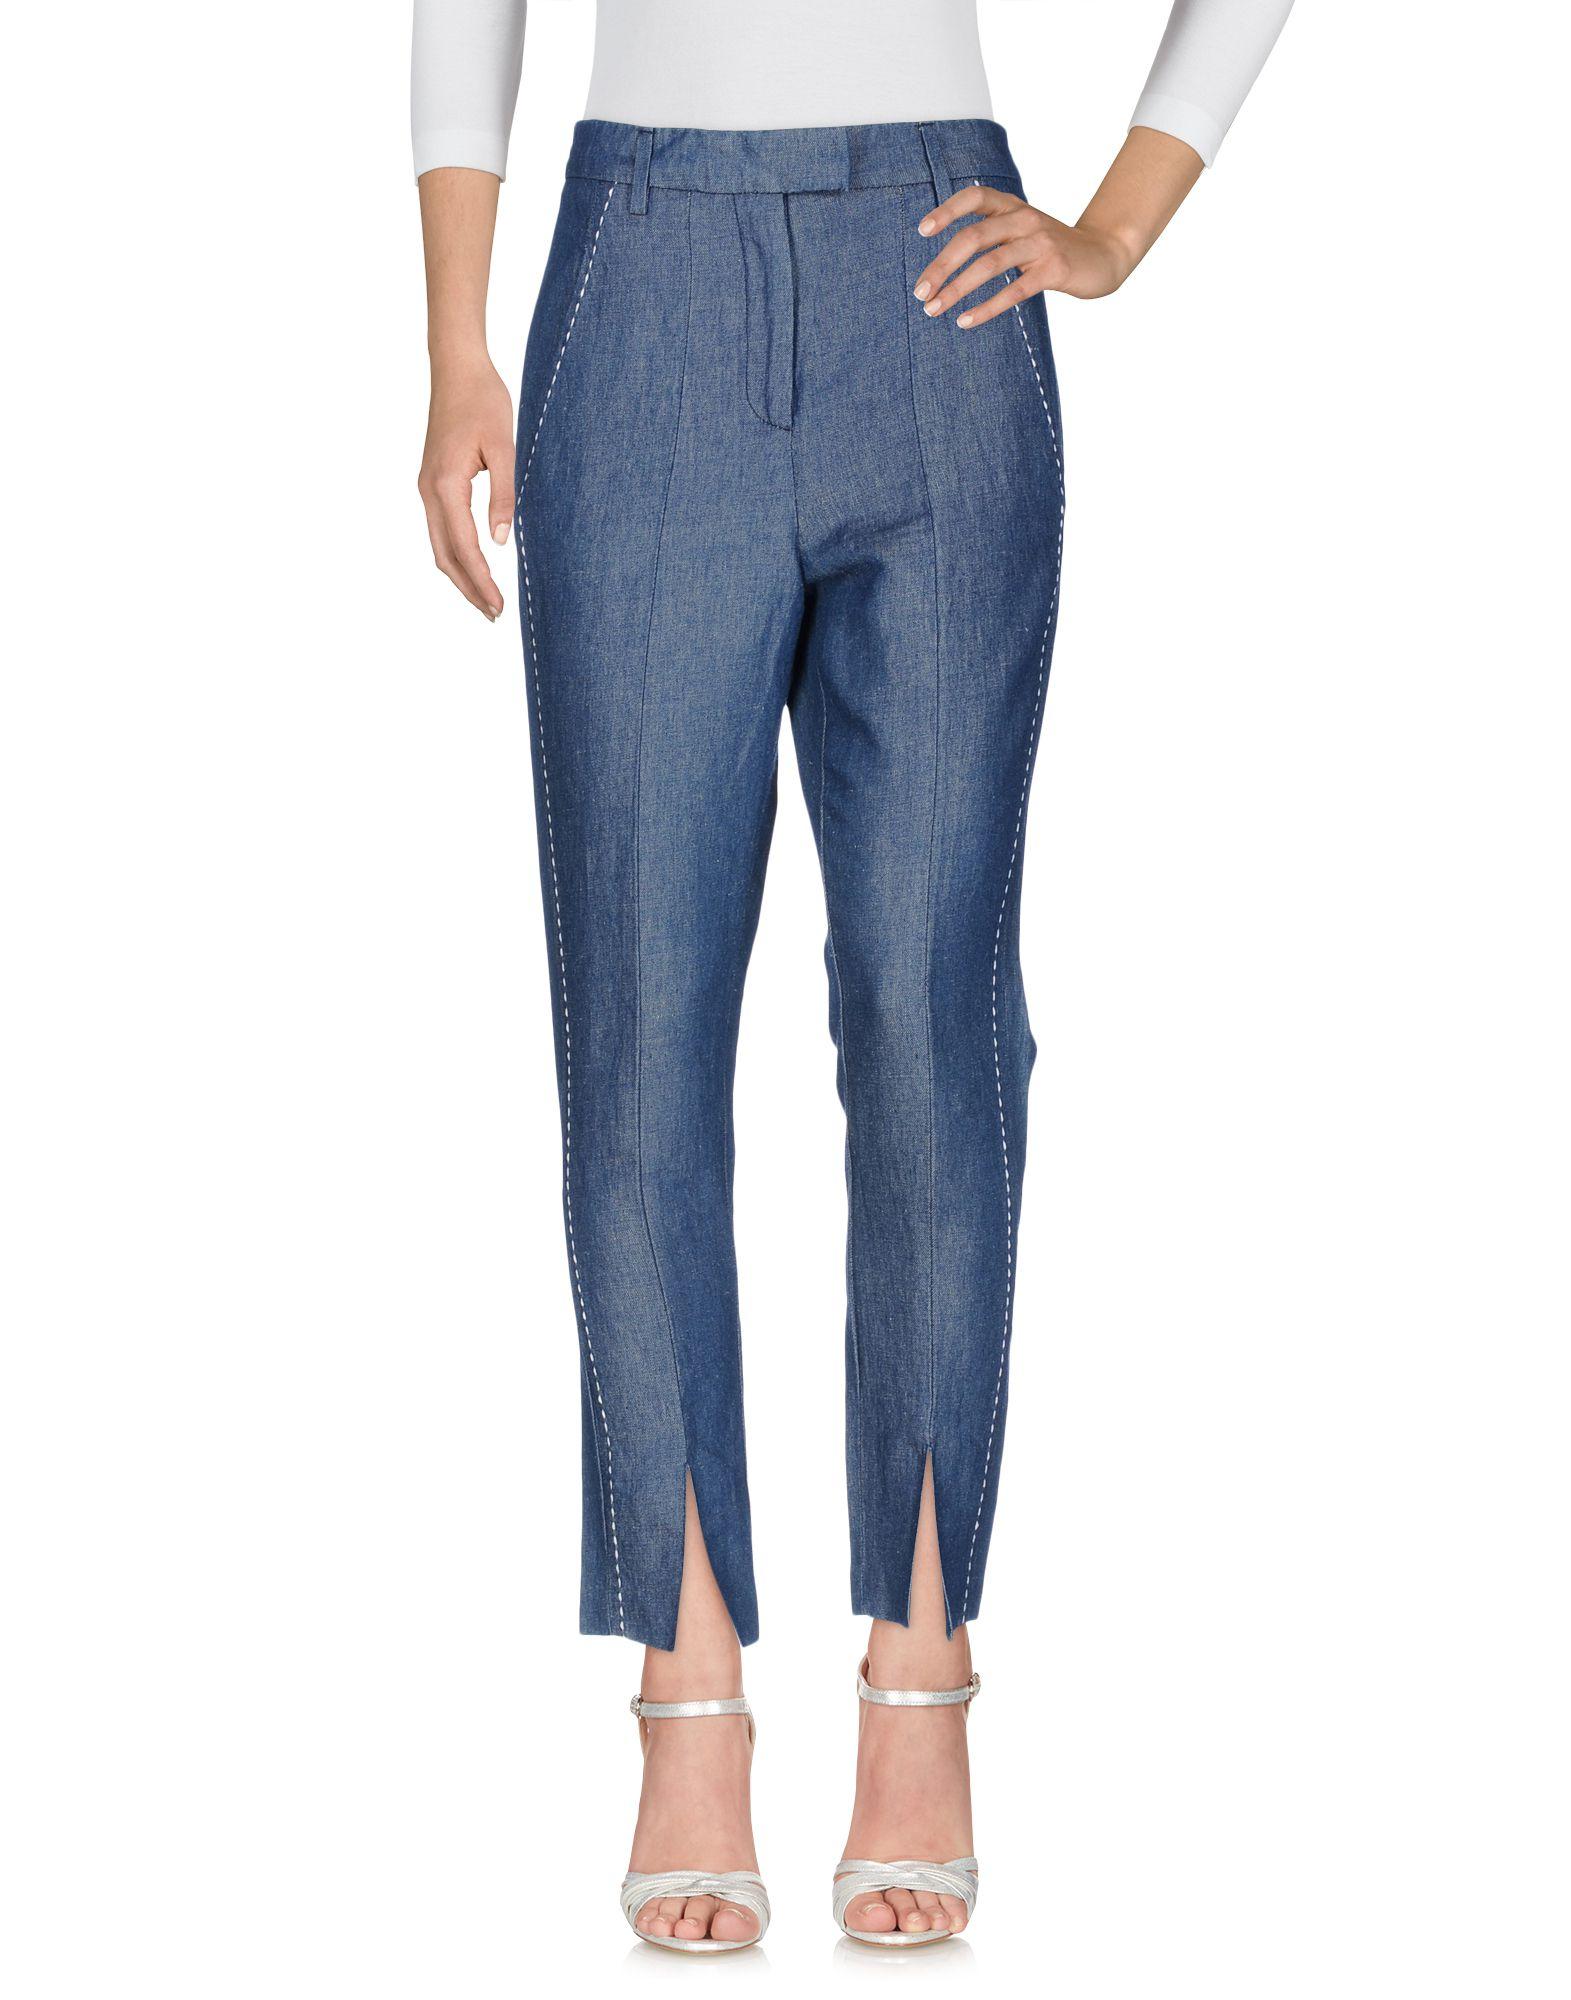 DONDUP Damen Jeanshose Farbe Blau Größe 4